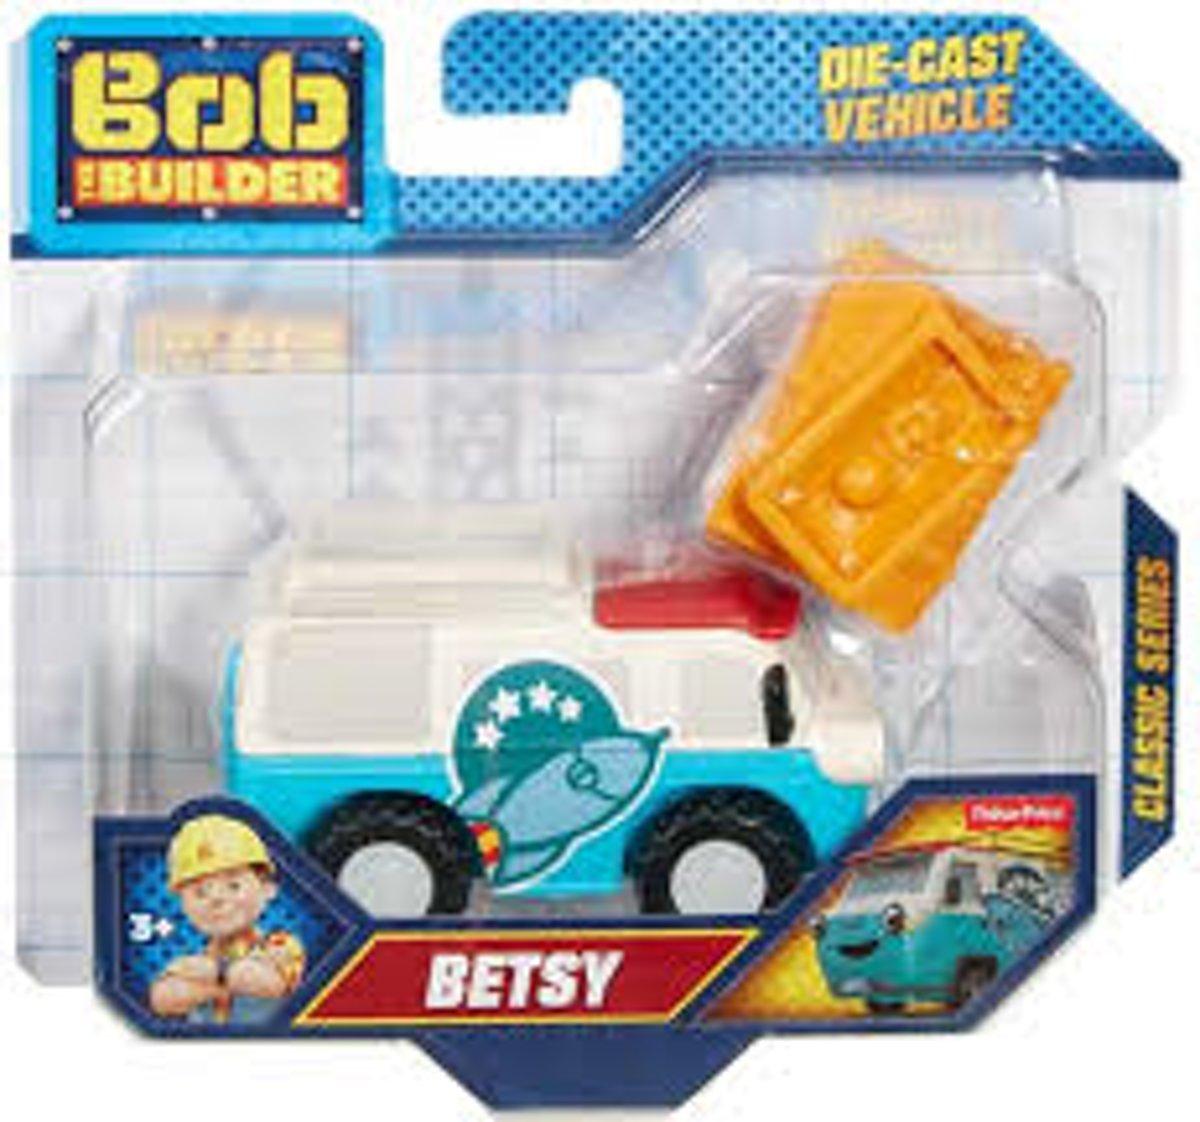 Bob de Bouwer Betsy